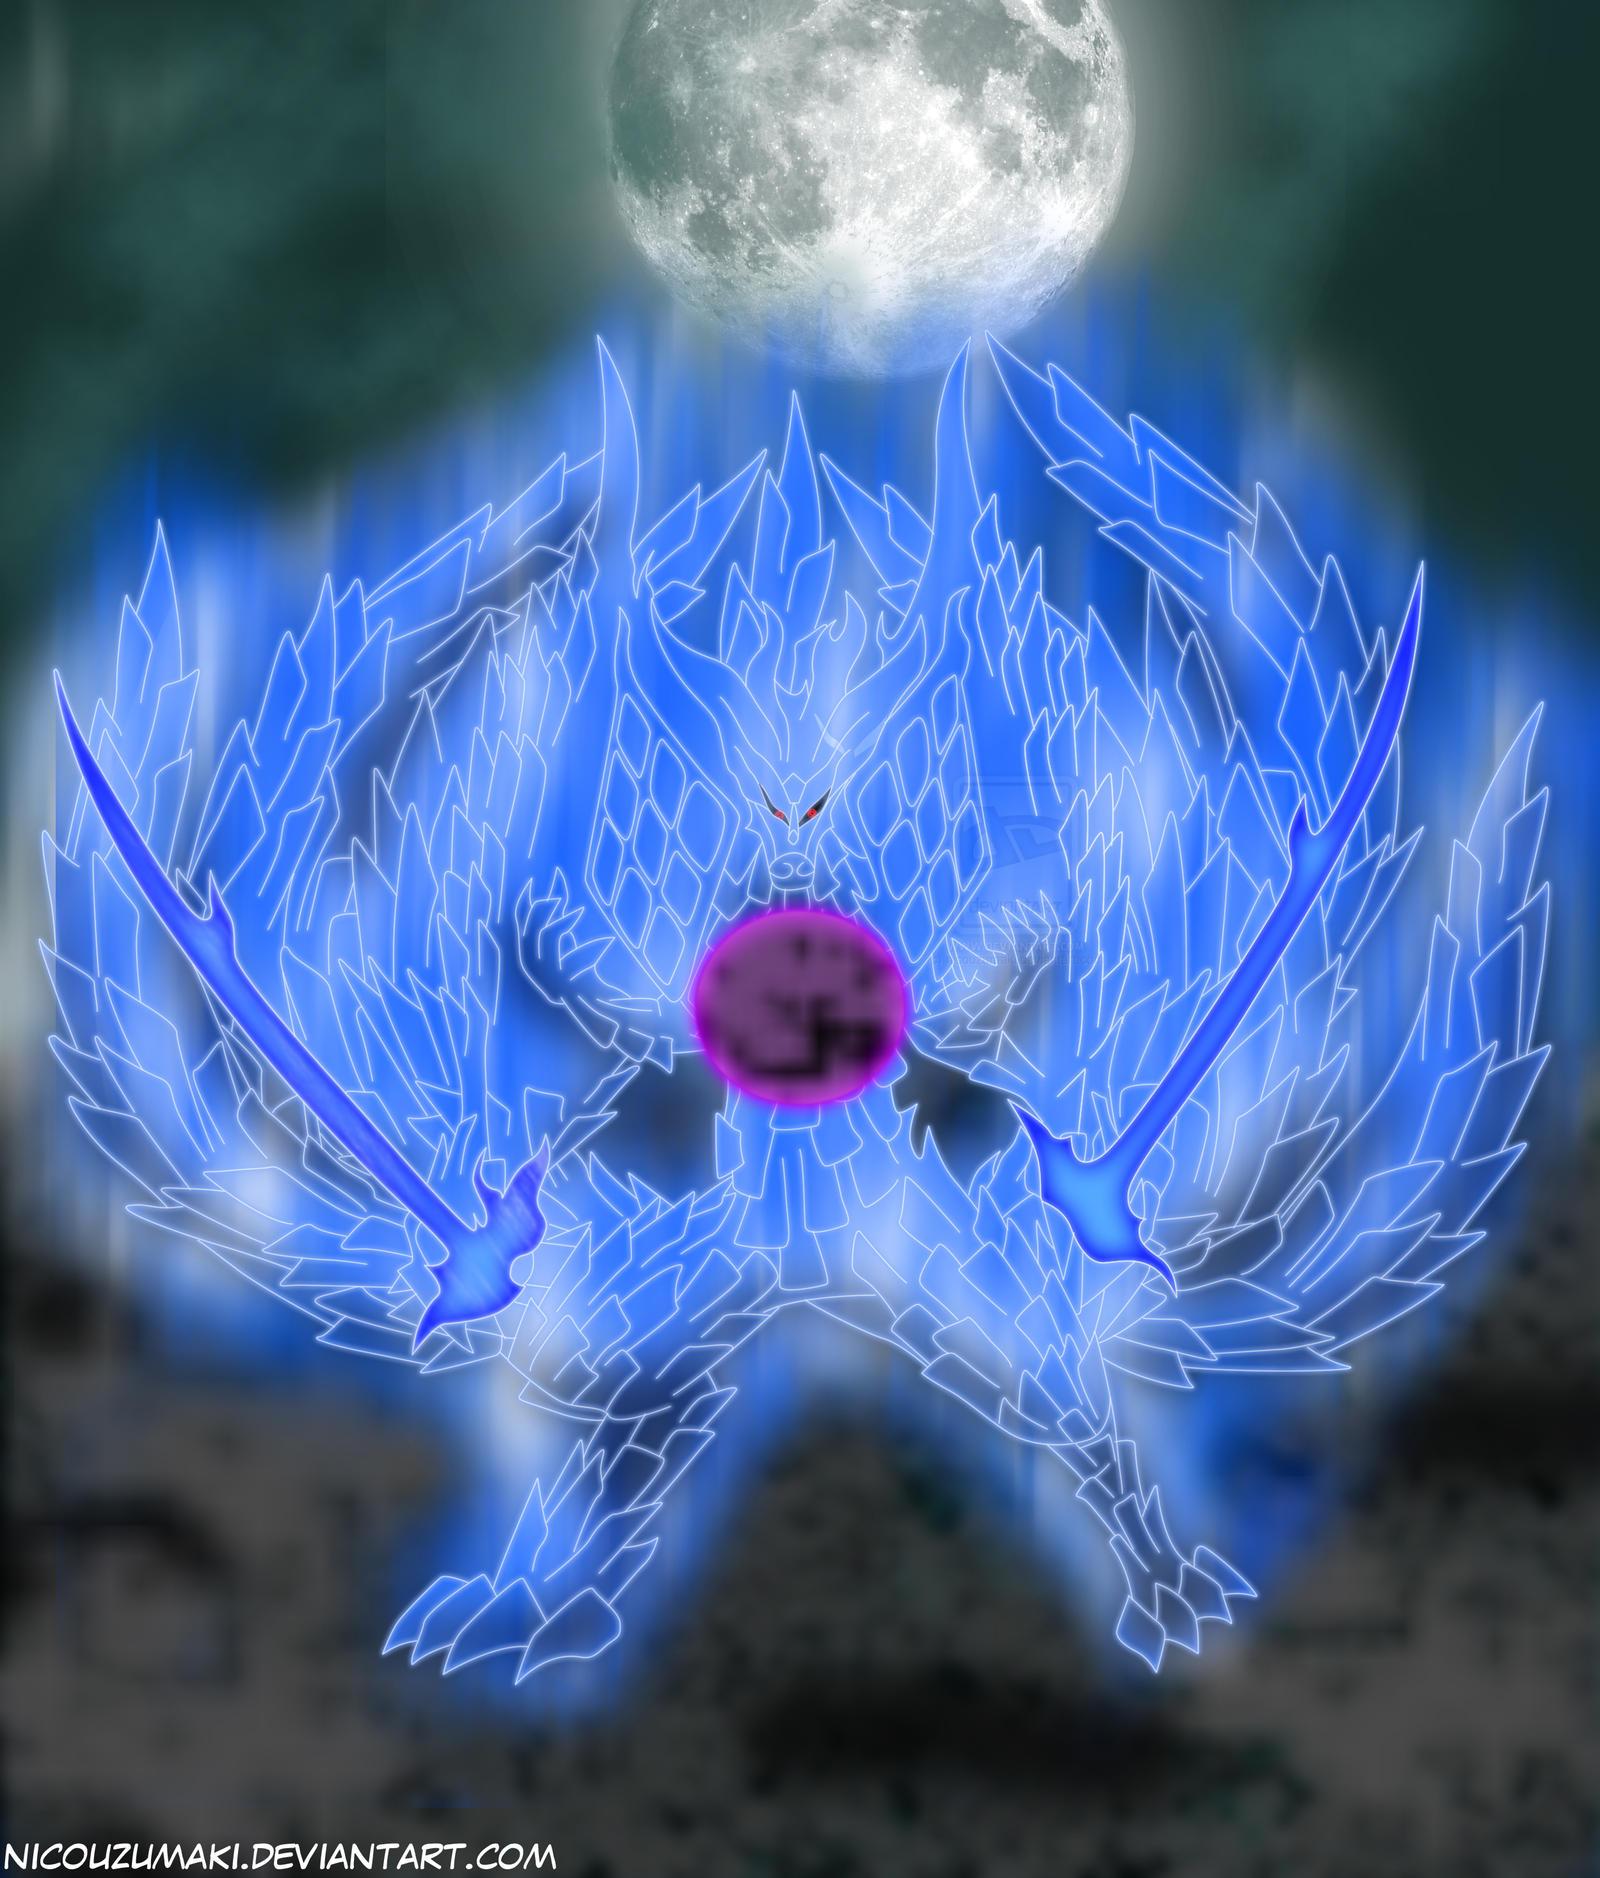 madara susano perfect kyubi fanart by nicouzumaki on ...